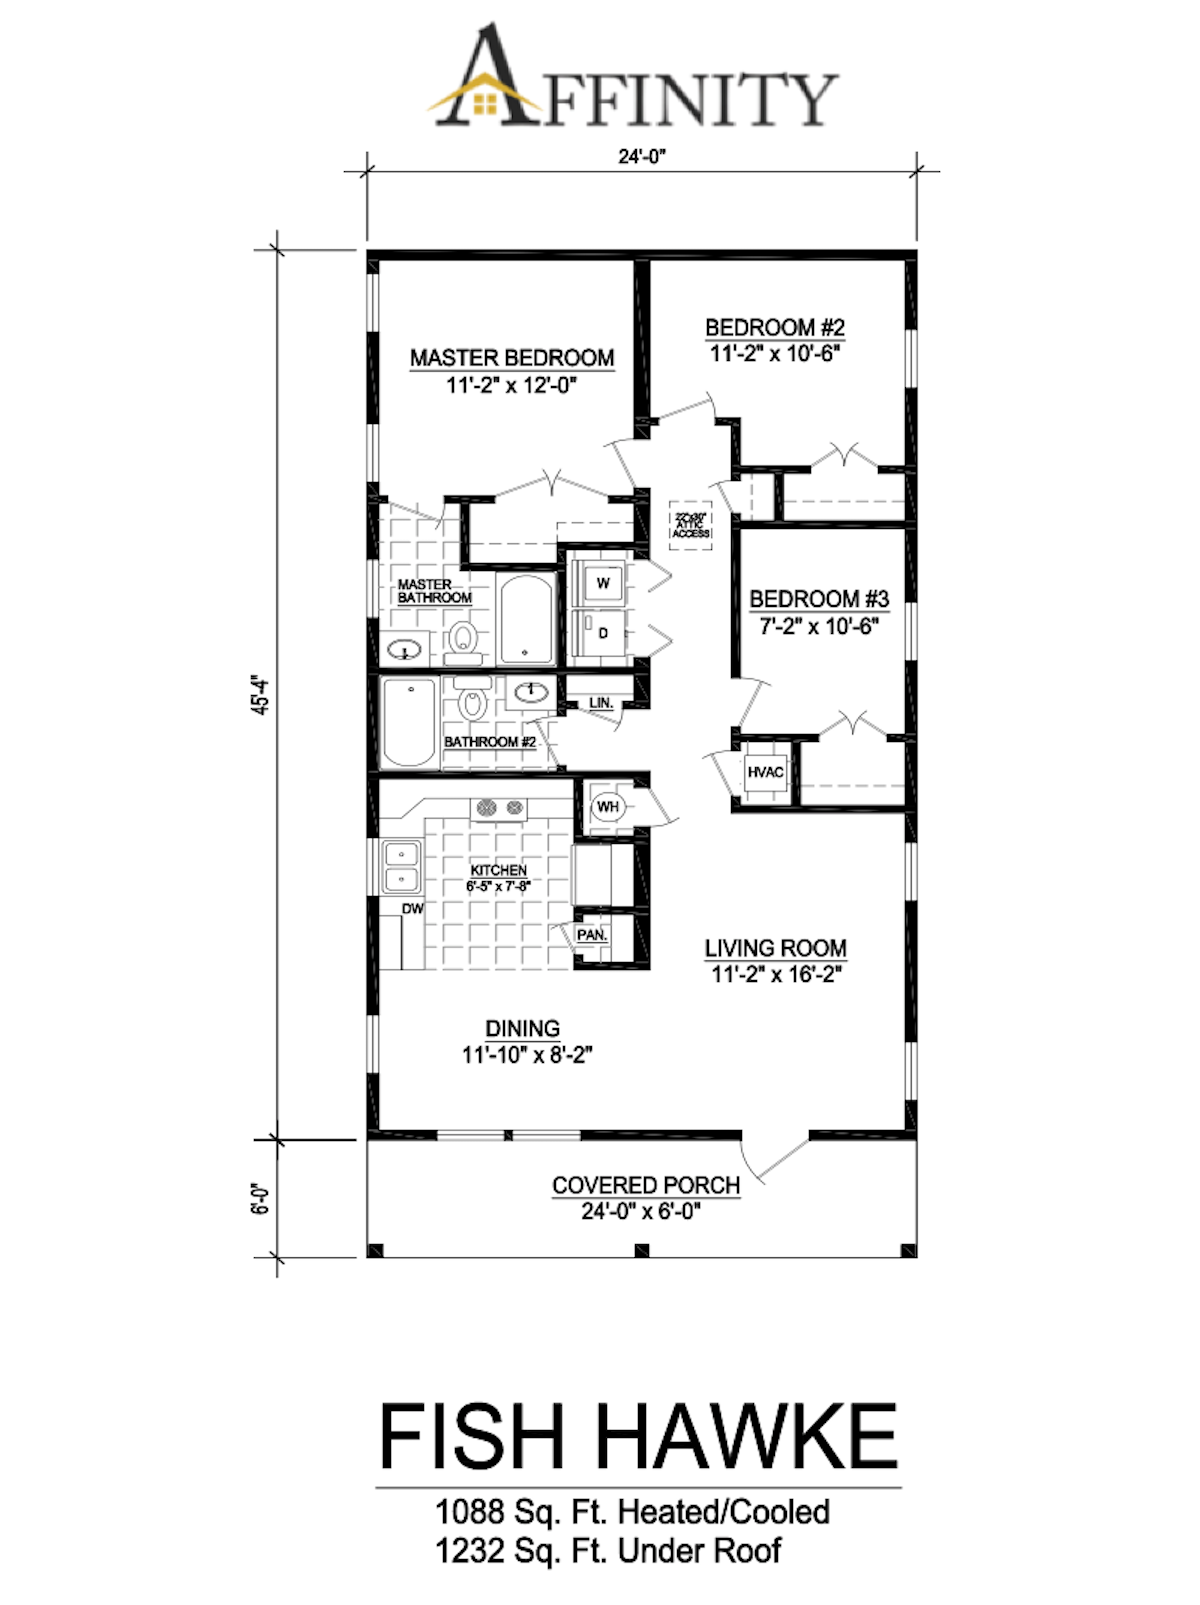 c732a4caa90404bb05a5b4d8735493e4 Coast Homes Llc Floor Plans on american vintage home plans, rainforest home plans, river home plans, cliff home plans, western home plans, three floor home plans, warehouse home plans, shore home plans, island home plans,